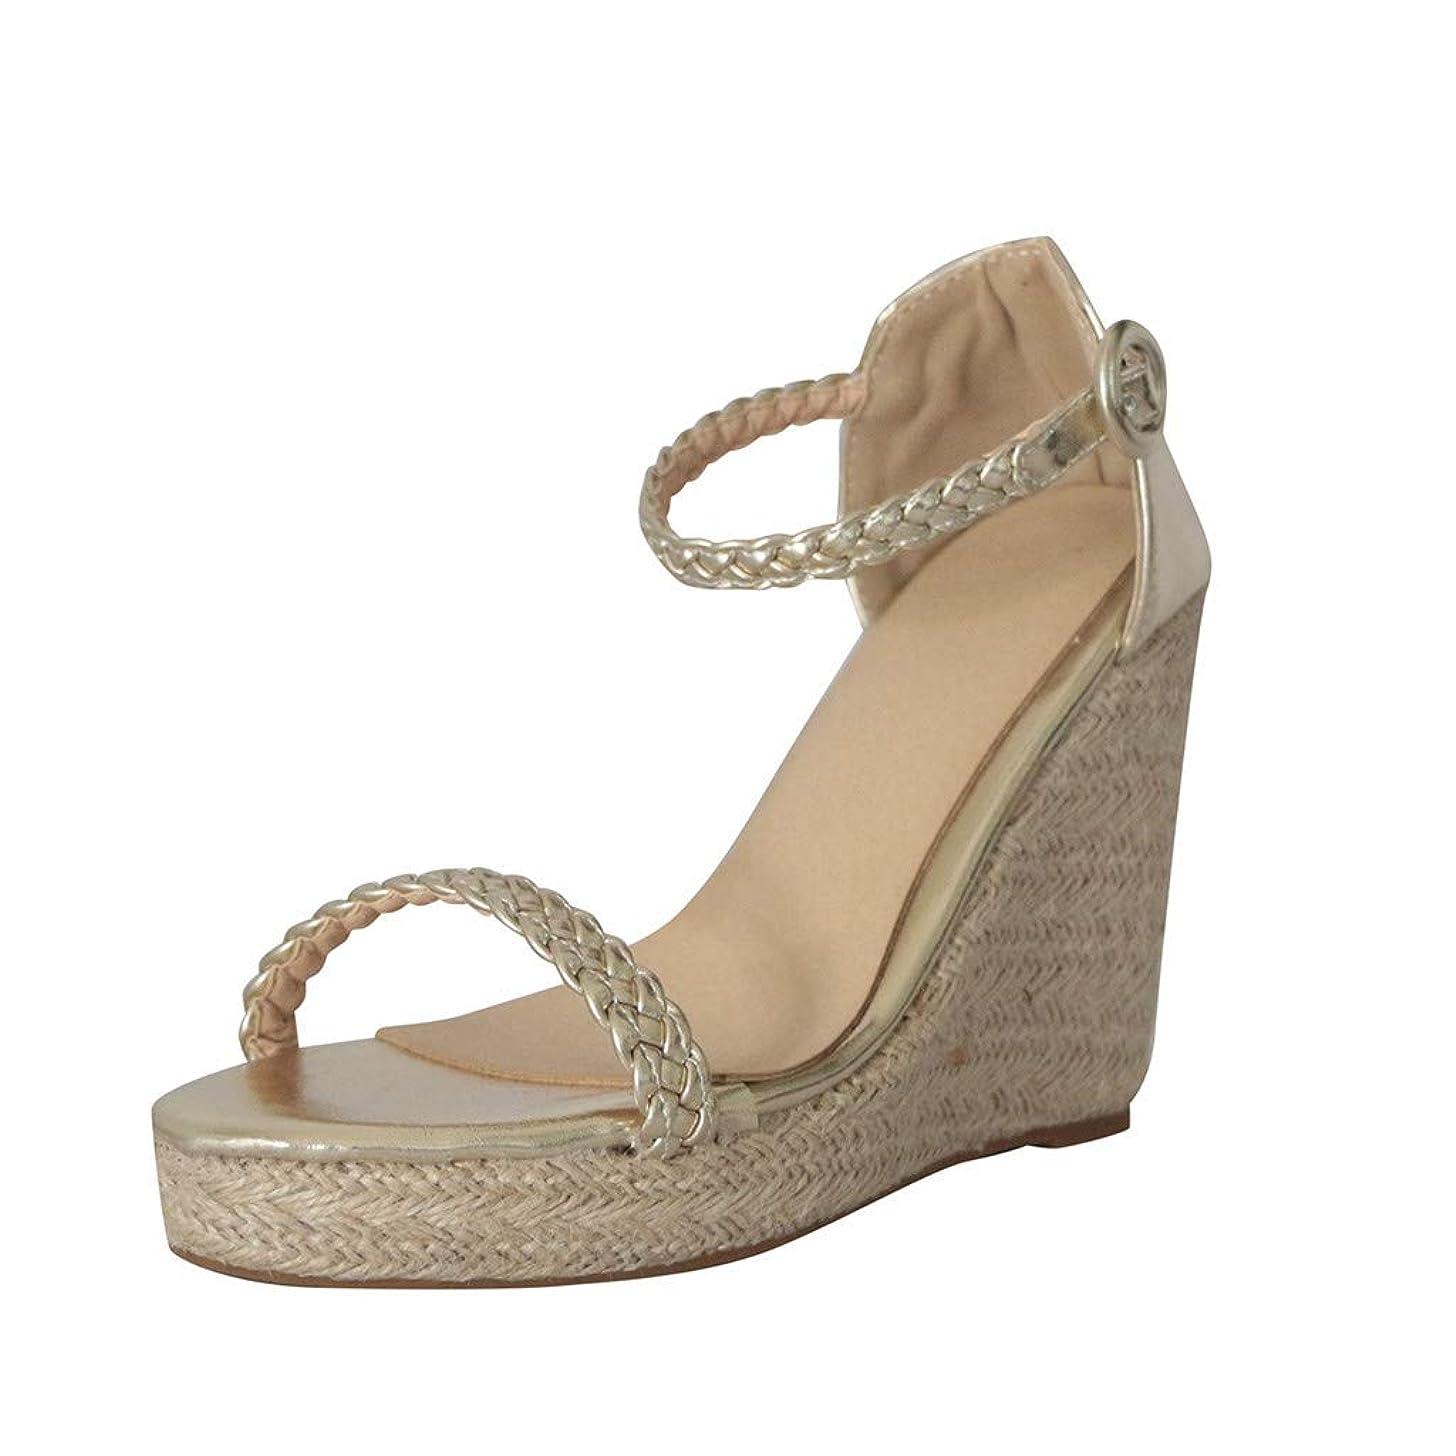 Women's Casual Peep Toe Single Buckle Super High Platform Strap Shoes Roman Wedges Sandals JHKUNO